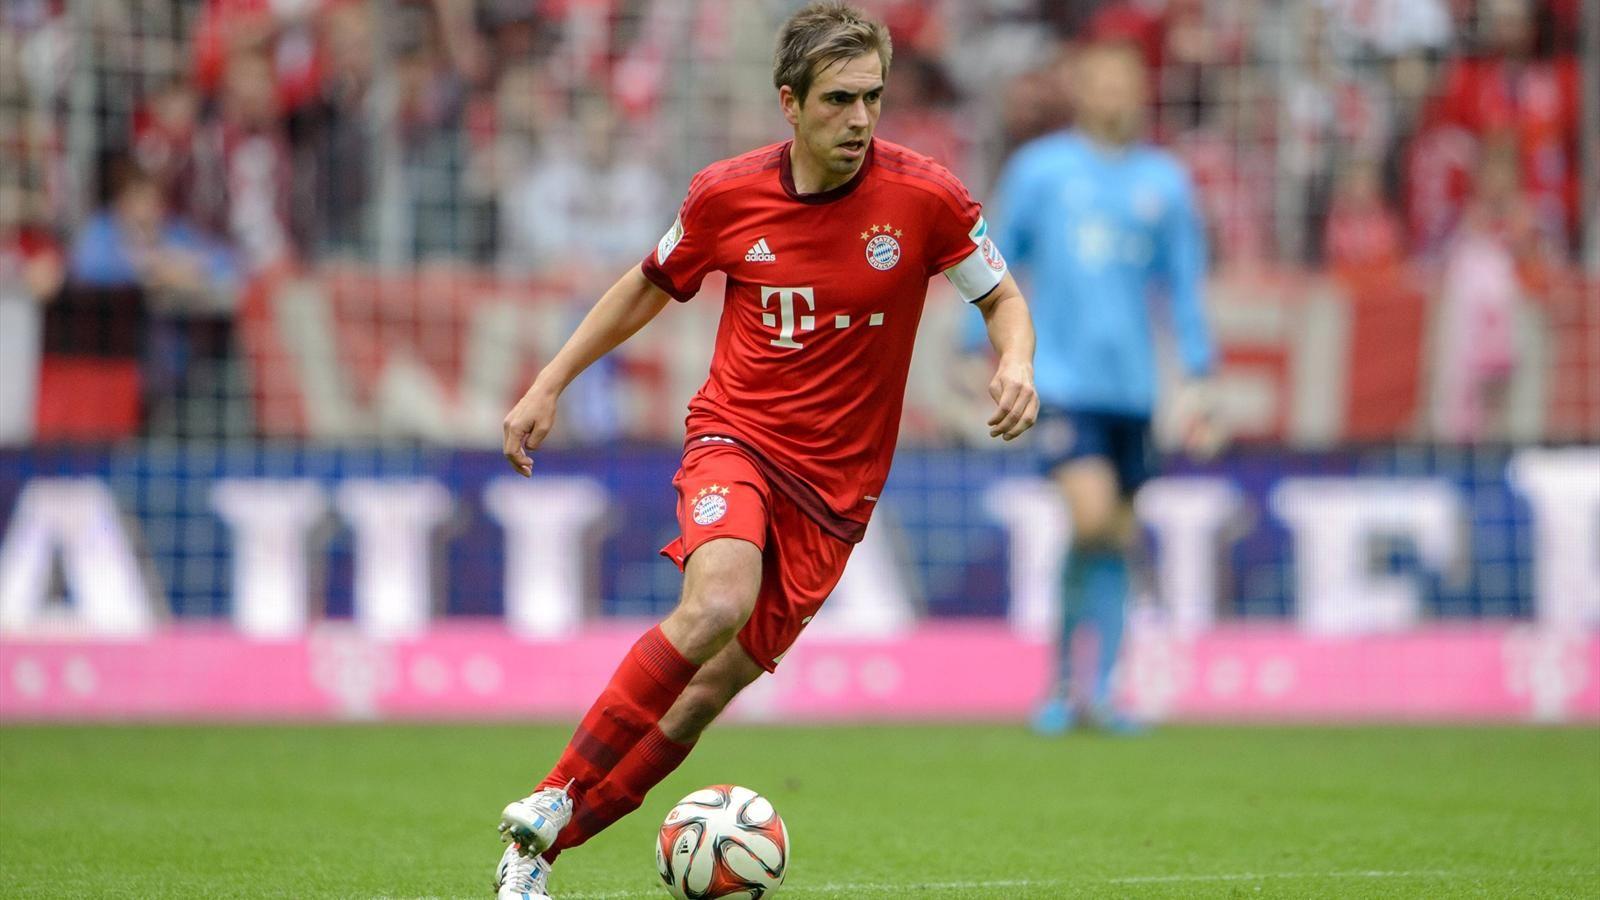 Philipp Lahm The Perfect Footballer The Culture Custodian